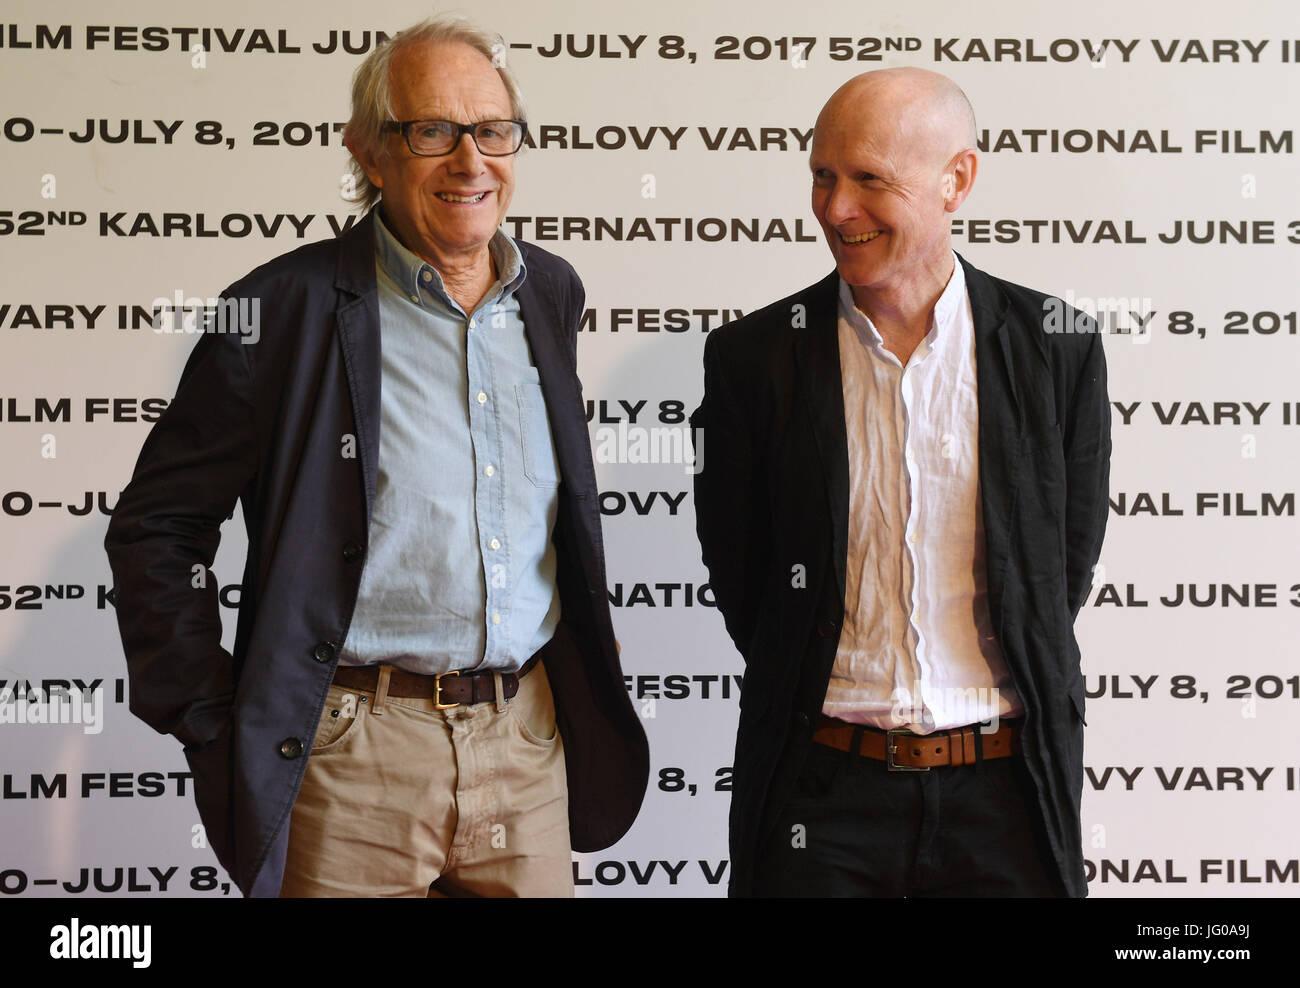 Karlovy Vary, Tschechien. 3. Juli 2017. Regisseur Ken Loach, links und seinem langjährigen Drehbuchautor Paul Stockbild